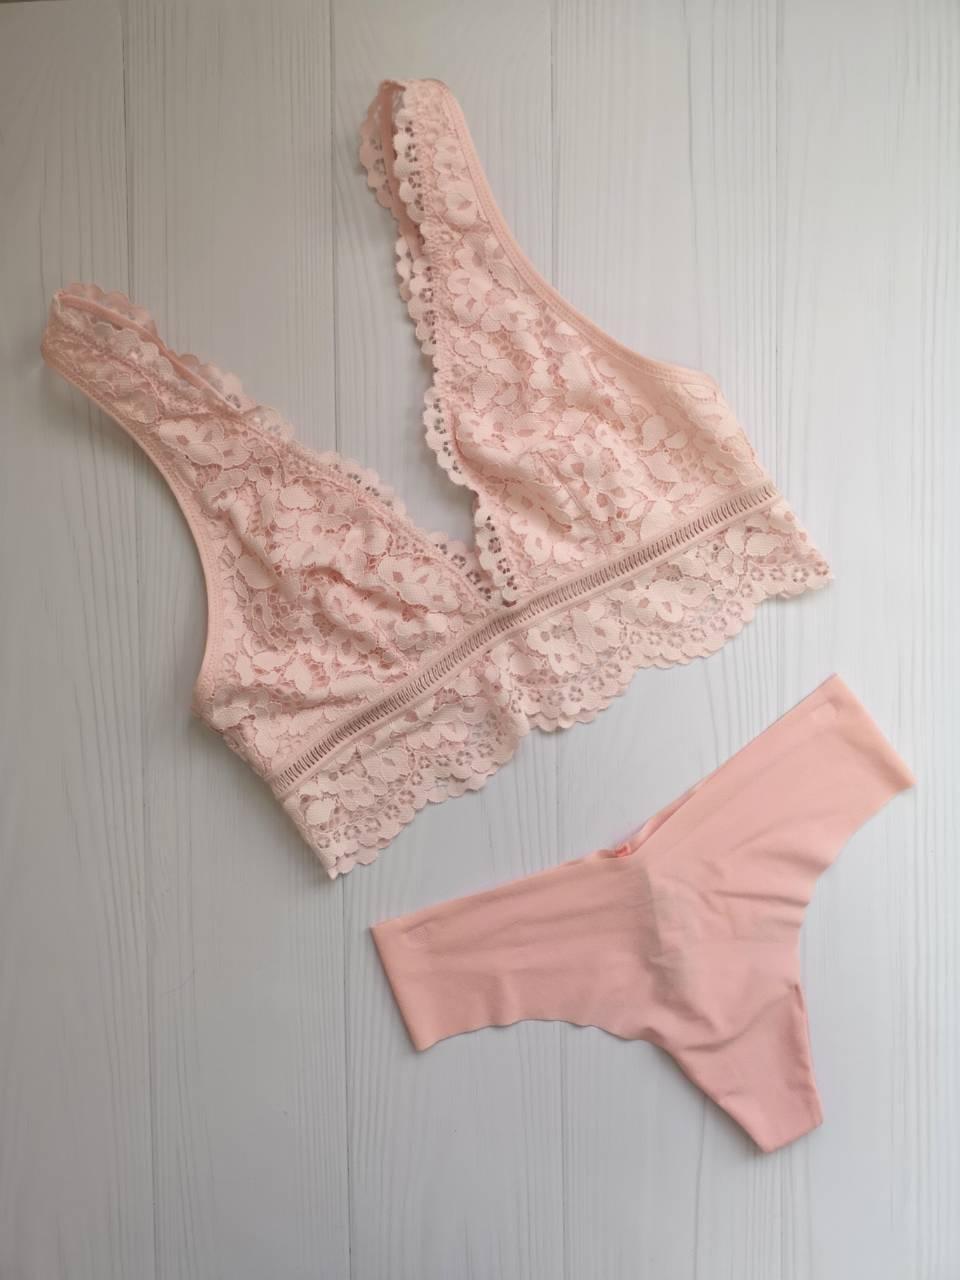 e1876637872b3 Комплект белья (бралетт+трусики) Victoria's Secret! Размер - S\S ...